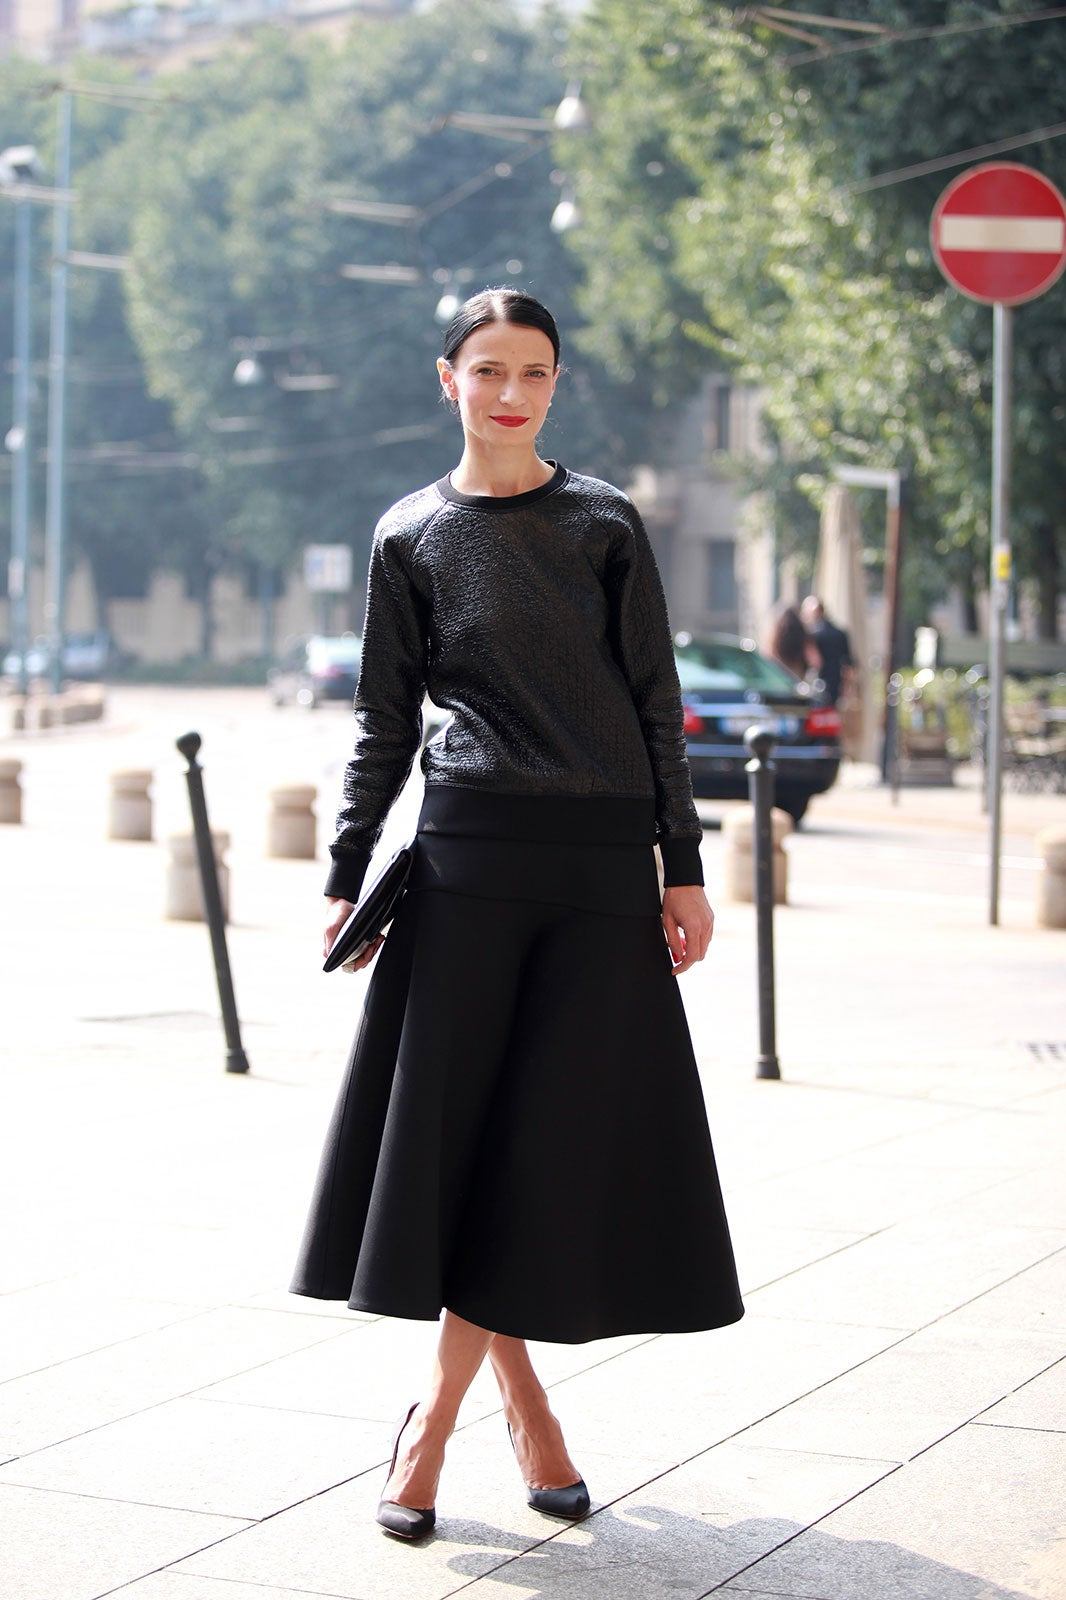 Milan Fashion Week Italian Street Style 2013